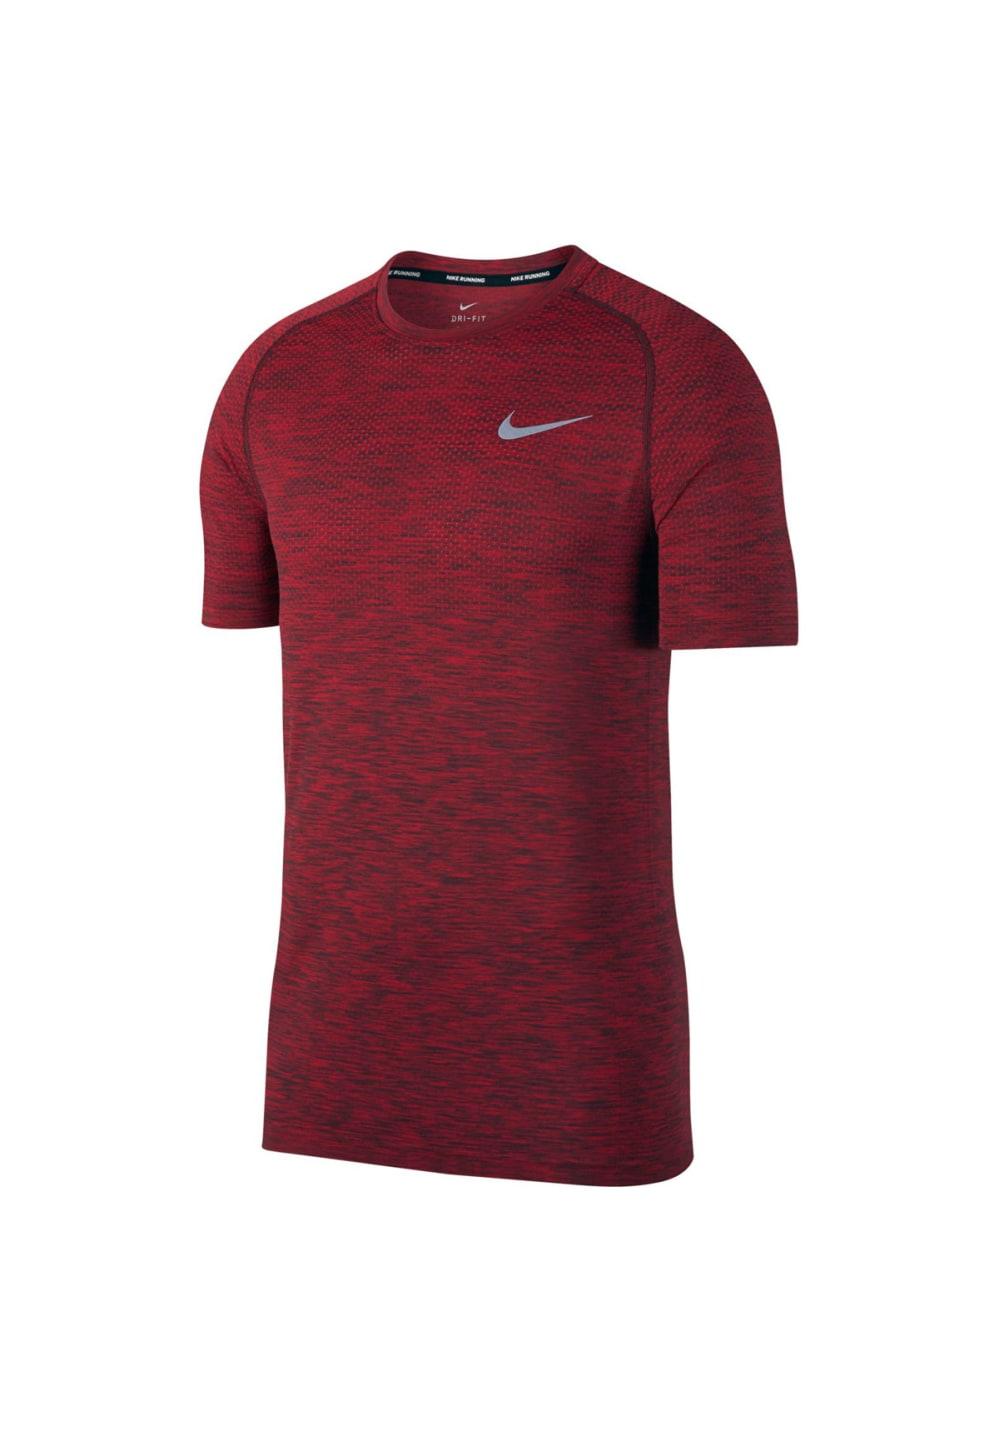 brand new 16c39 7ff56 Previous. Next. Nike. Dri-FIT Knit Running ...